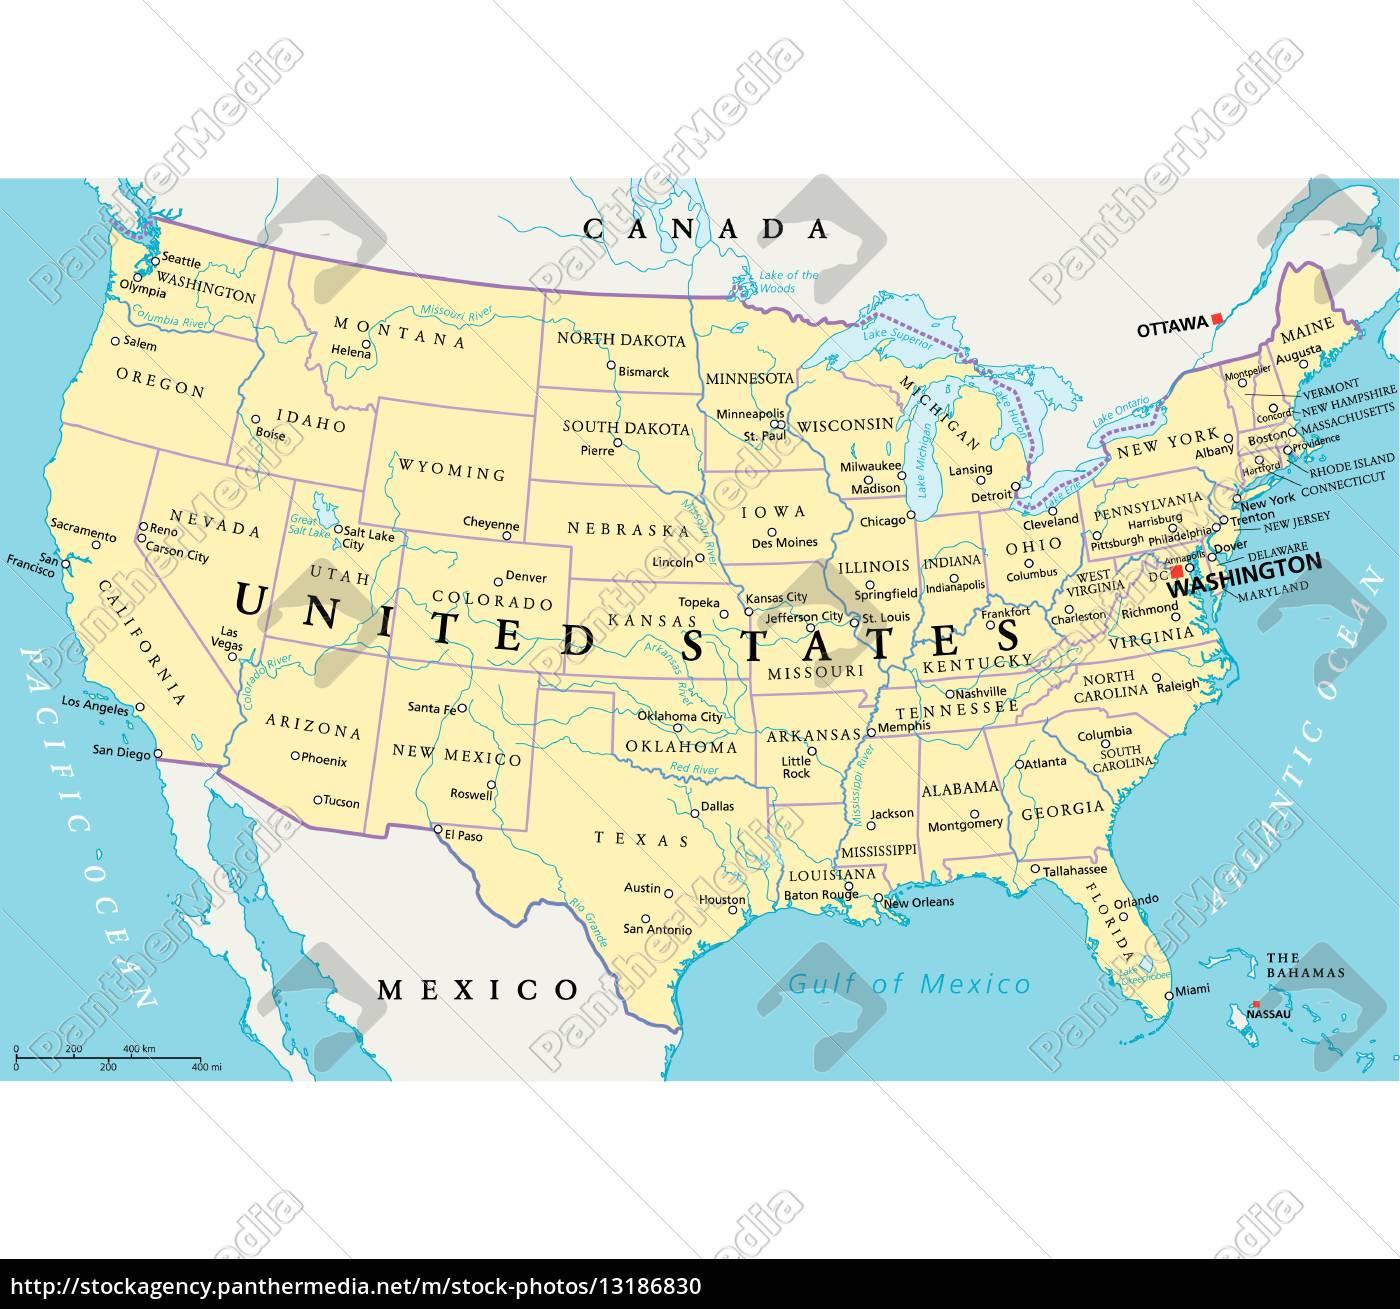 La Cartina Degli Stati Uniti D America.Mappa Politica Degli Stati Uniti D America Stockphoto 13186830 Comprate Immagini Rf Da Panthermedia